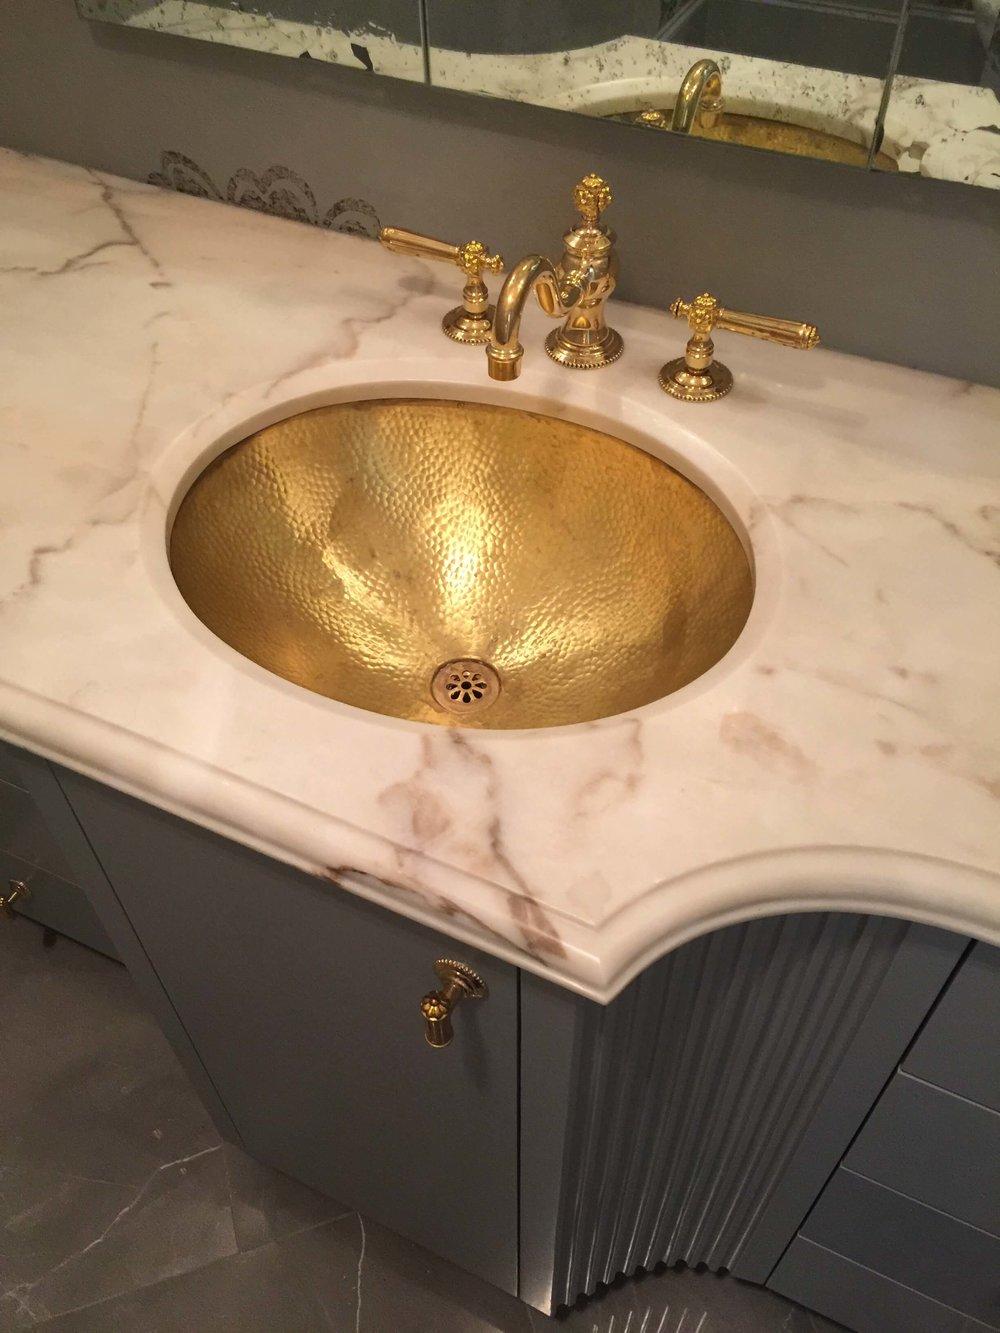 POWDER BATH ROUND UP |Powder bath with brass hammered sink and faucet | Designer:  Beth Lindsey ,seen at  ASID Showhouse 2017 #powderbath #powderroom